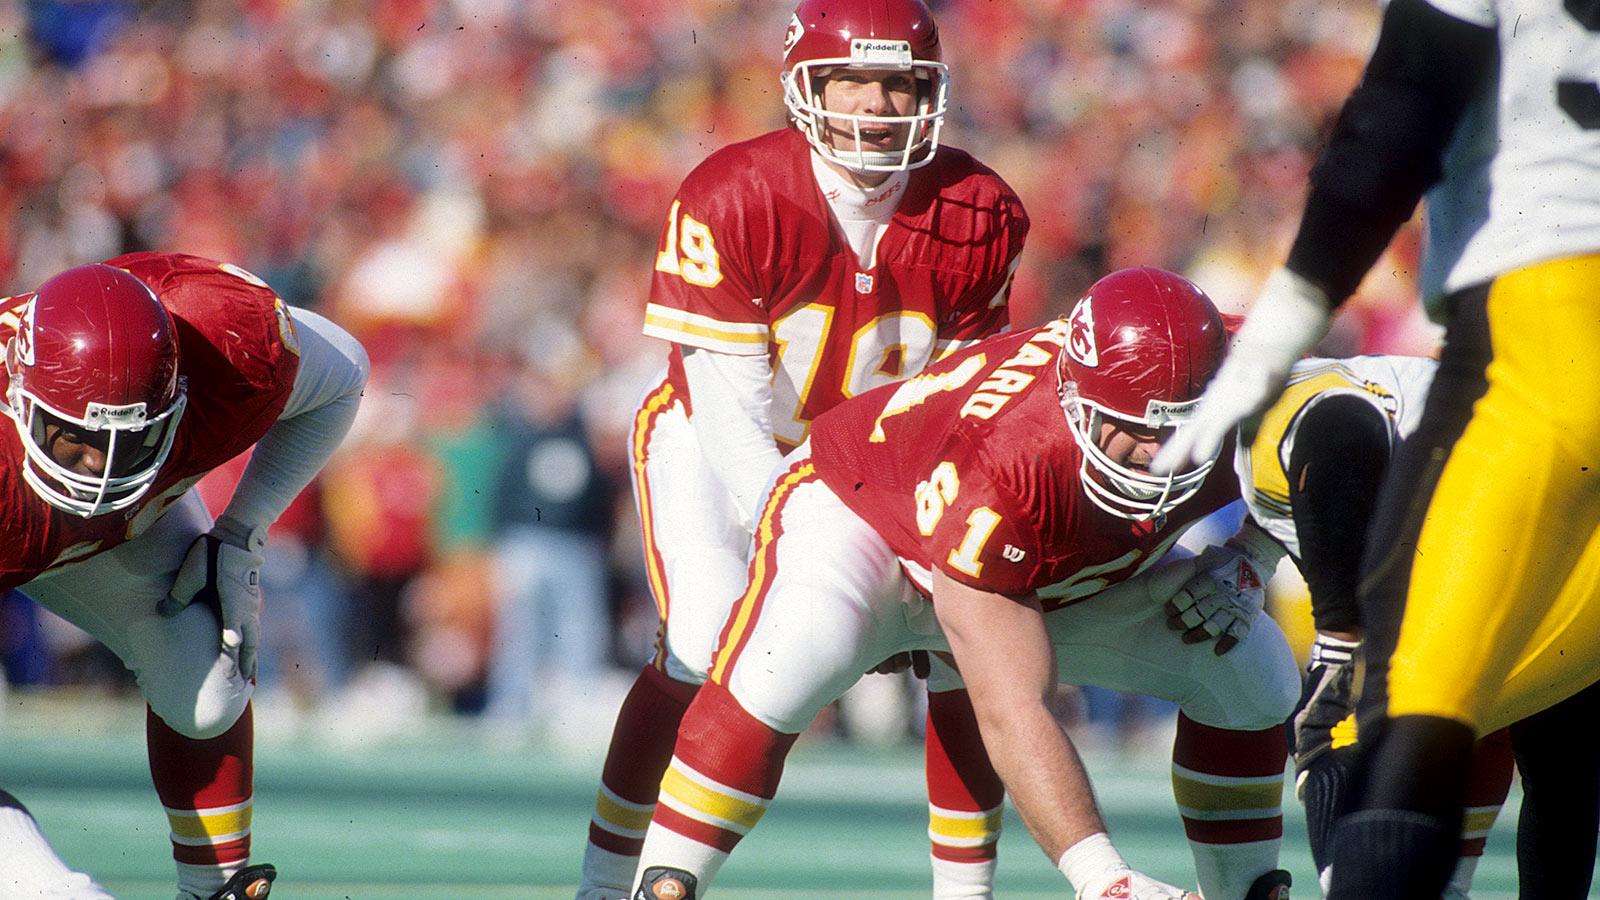 Alex Smith becomes first Chiefs quarterback to win playoff game since Joe Montana